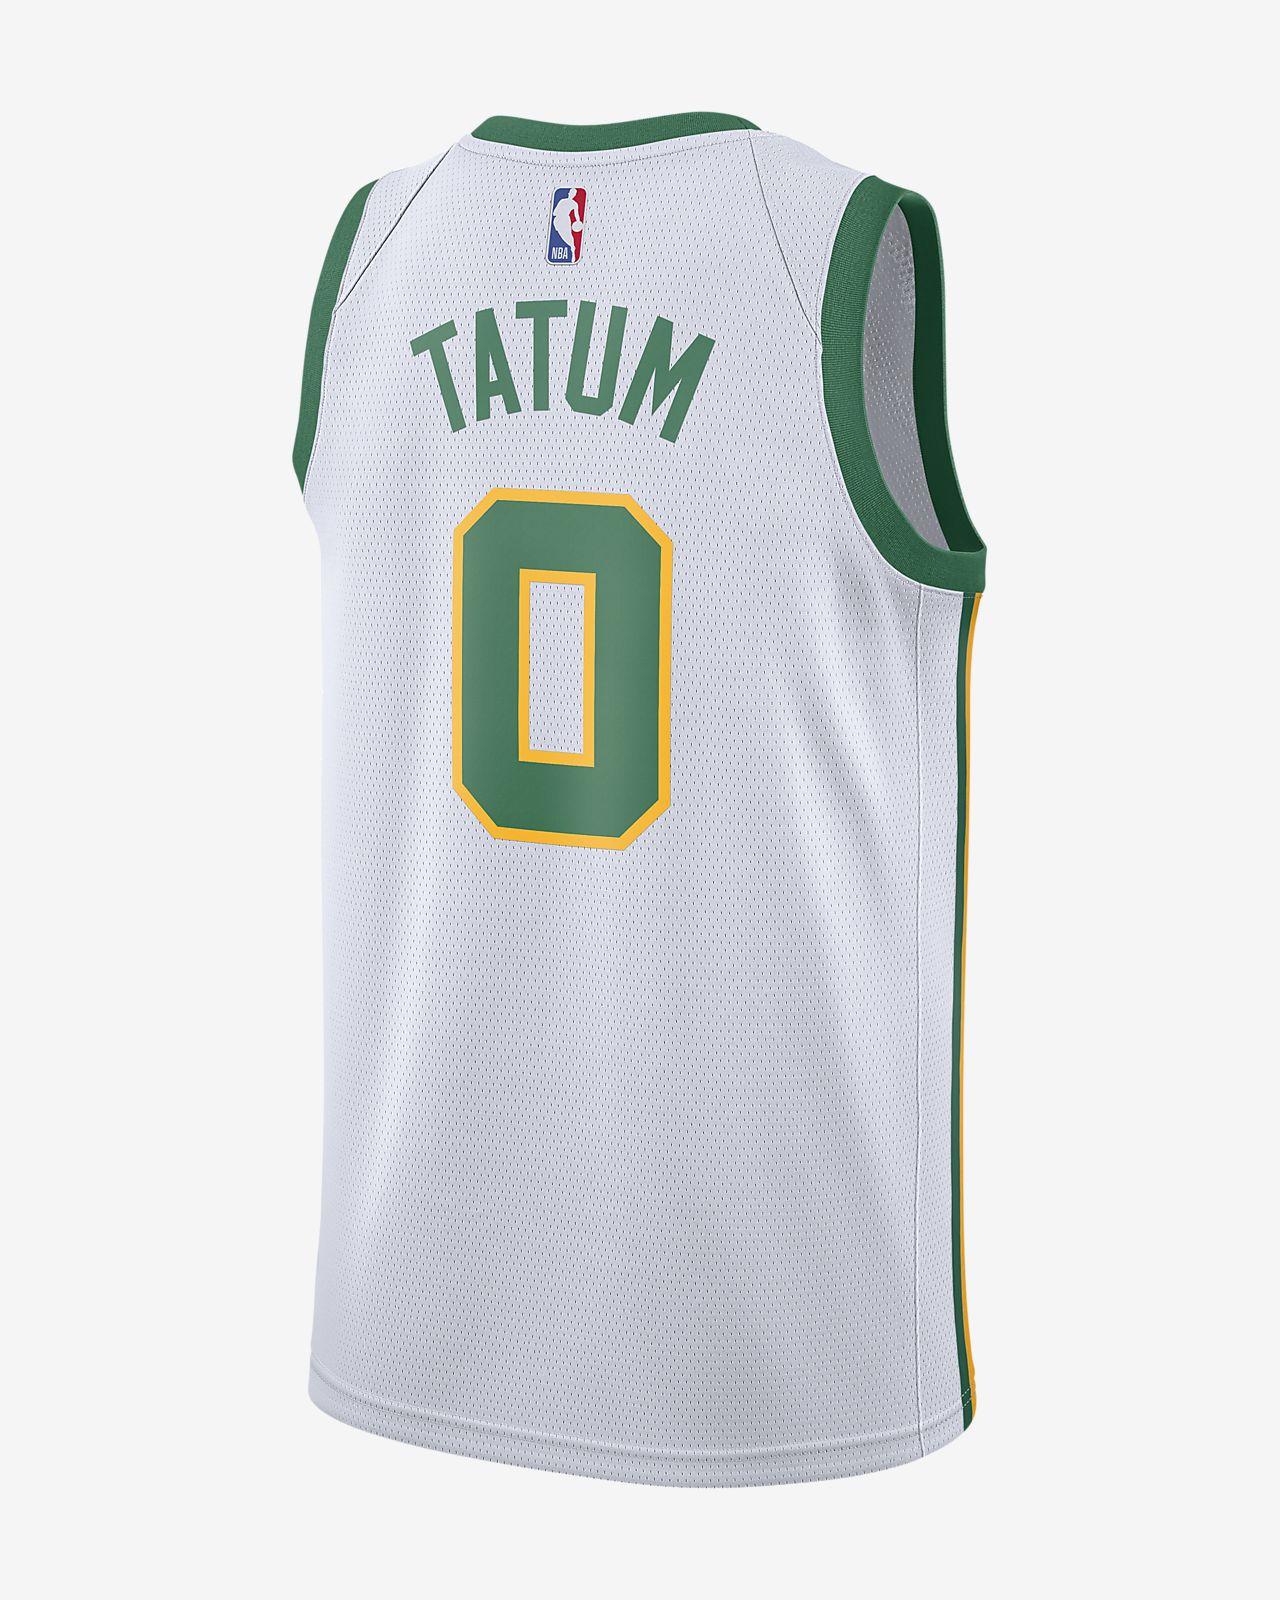 3a4078d171a4 ... Jayson Tatum City Edition Swingman (Boston Celtics) Men s Nike NBA  Connected Jersey